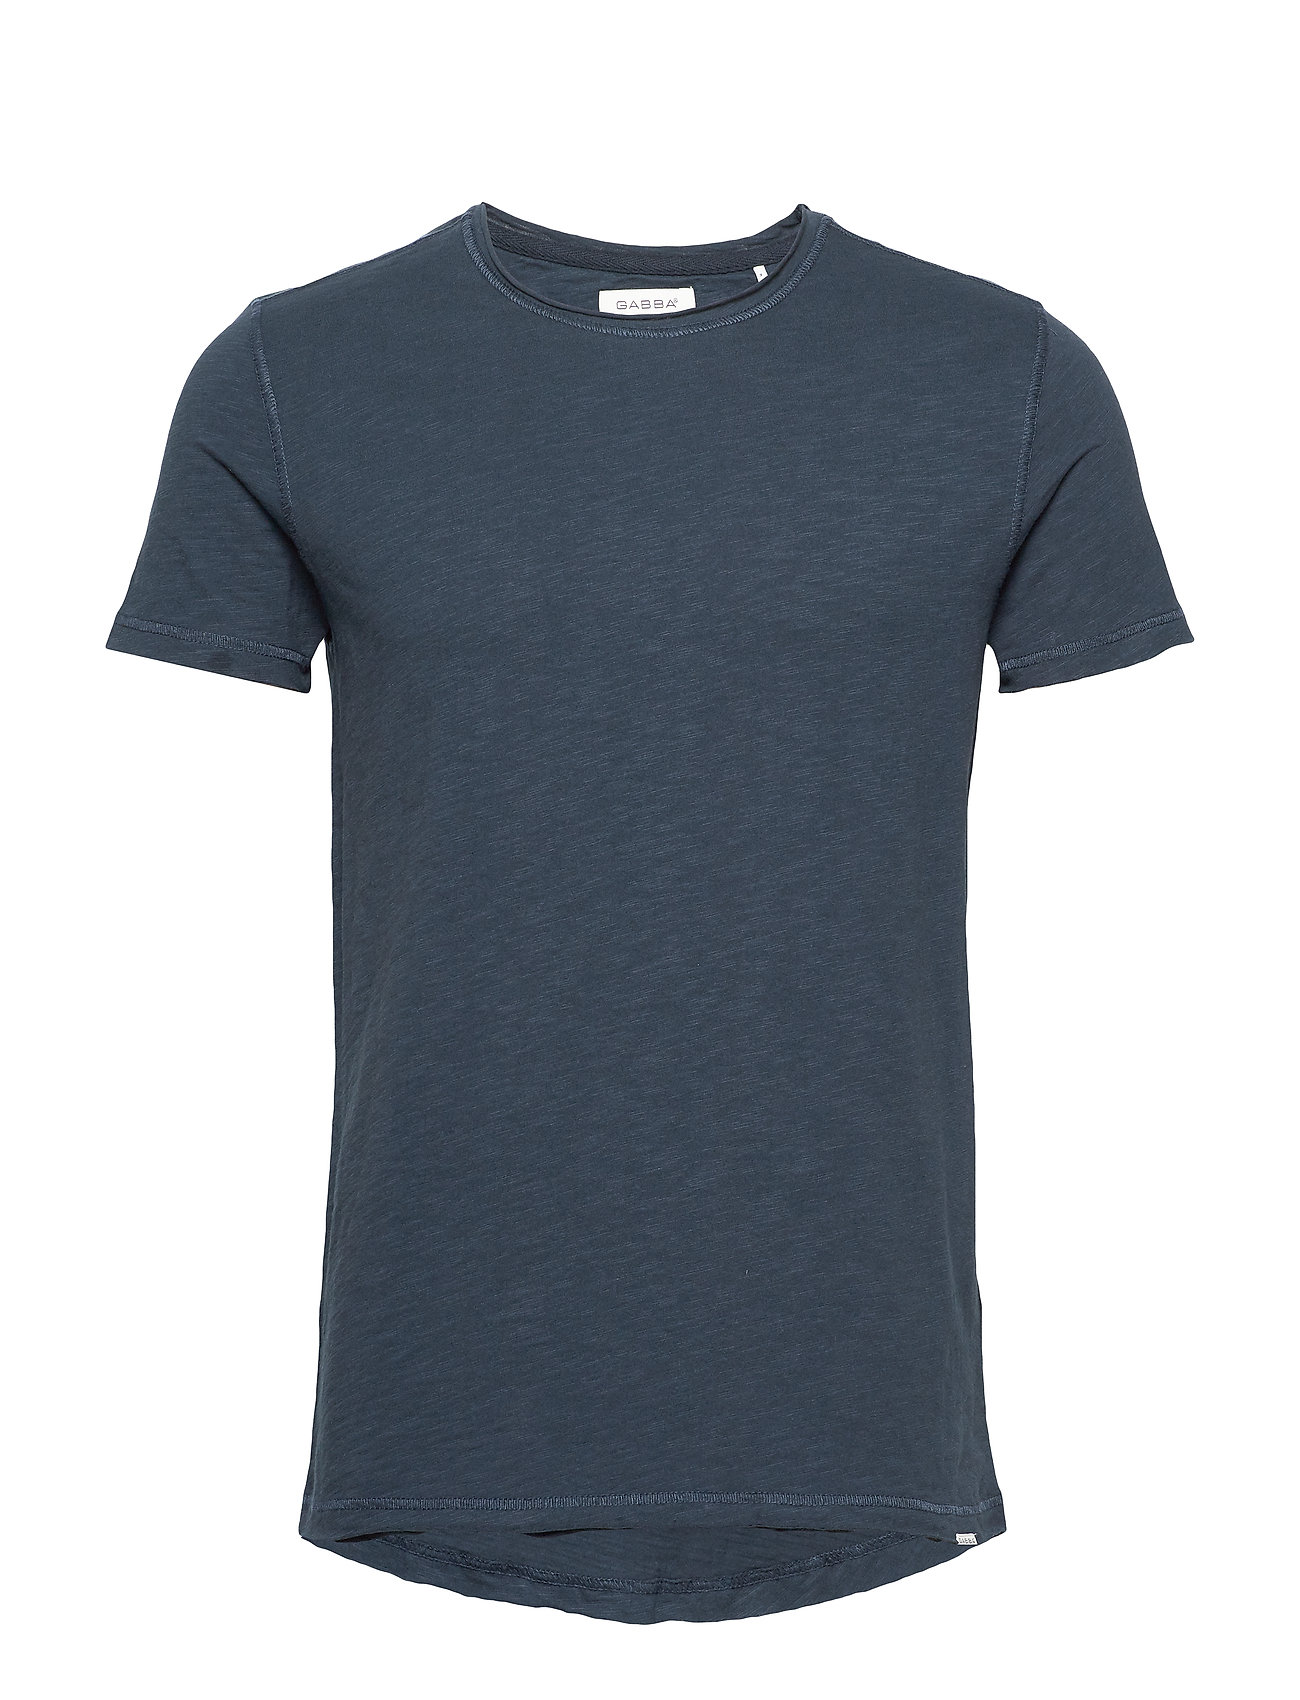 Image of Konrad Slub S/S Tee T-shirt Blå Gabba (3309077219)